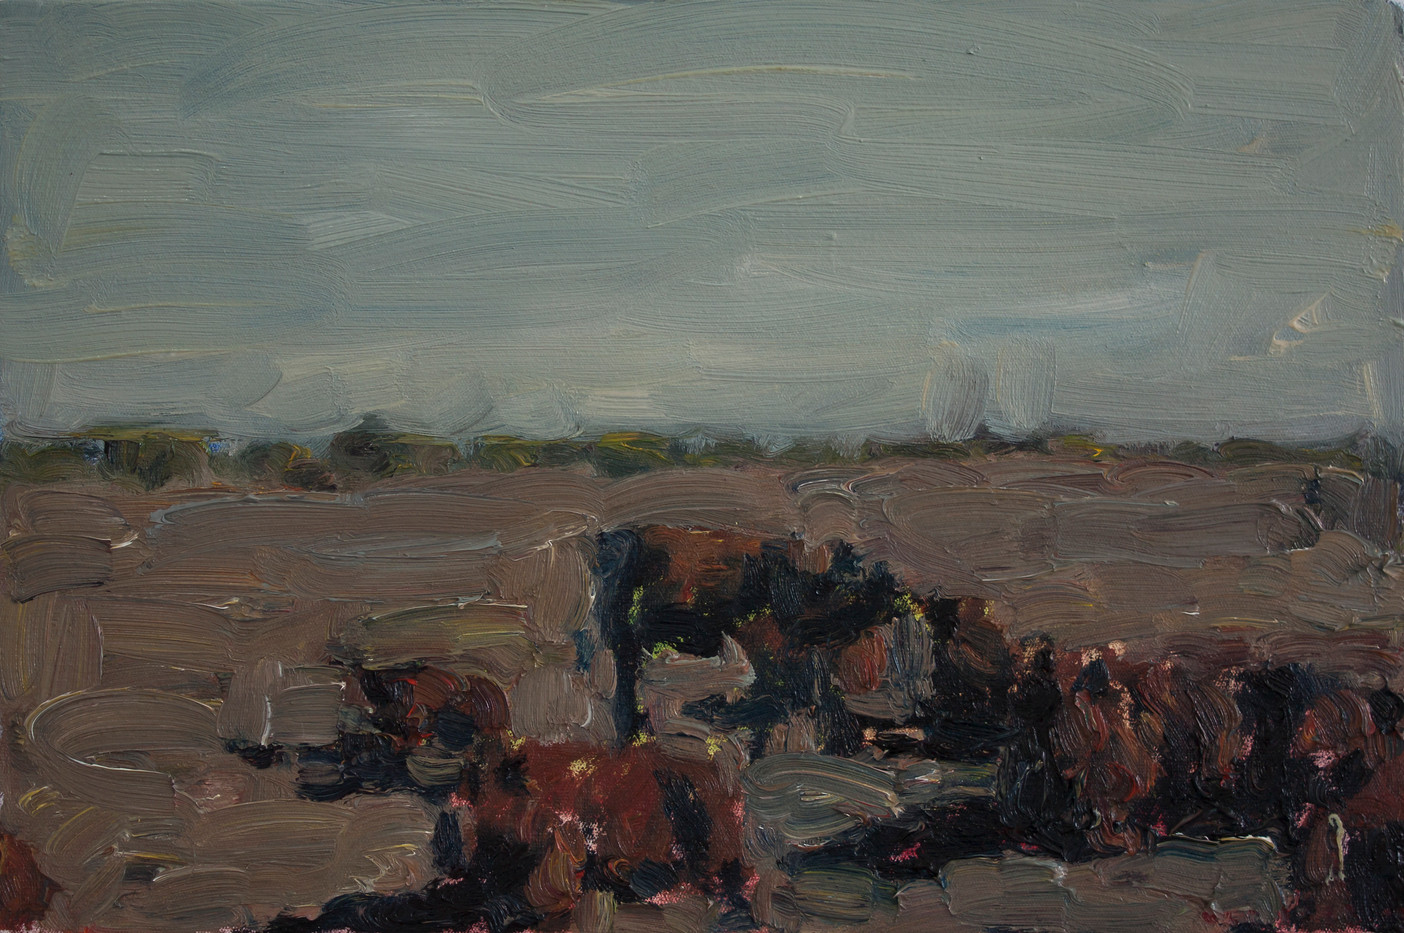 Anton Karstel | Property (Kuruman) | 2014 | Oil on Canvas | 30 x 45 cm